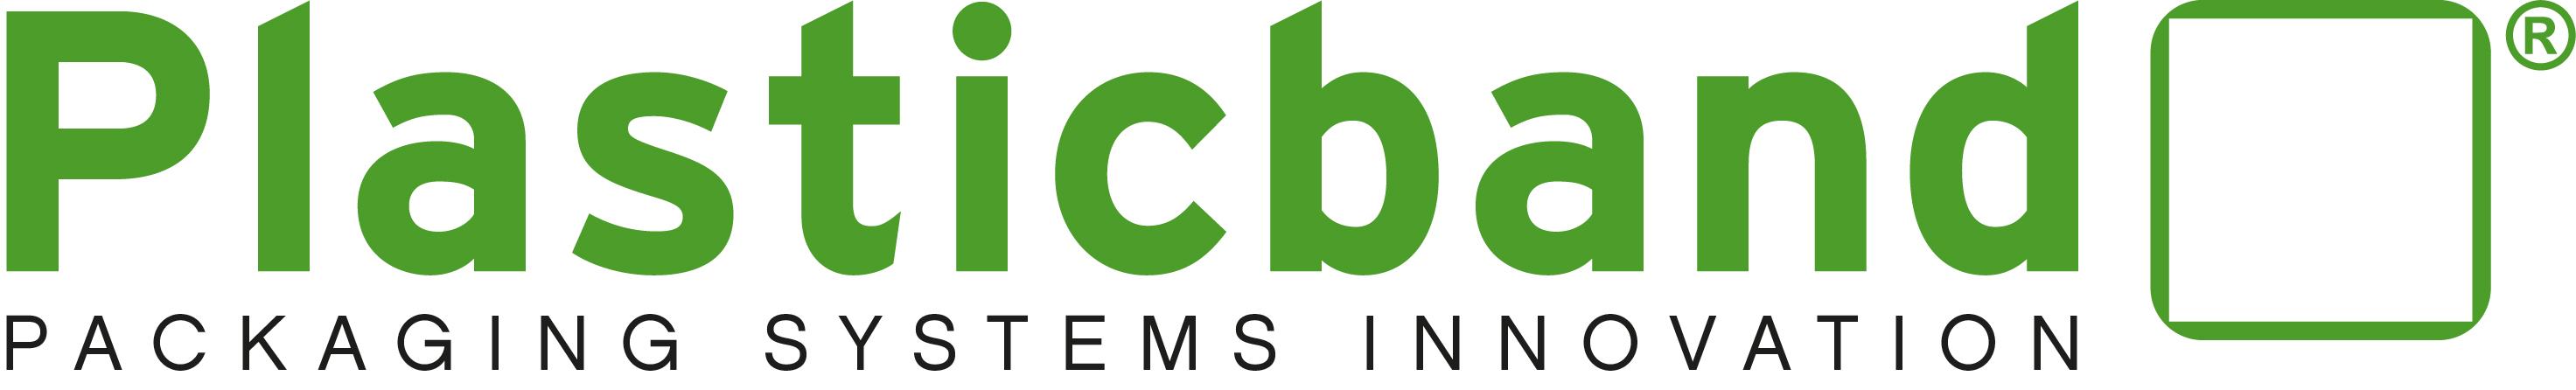 Plasticband logo